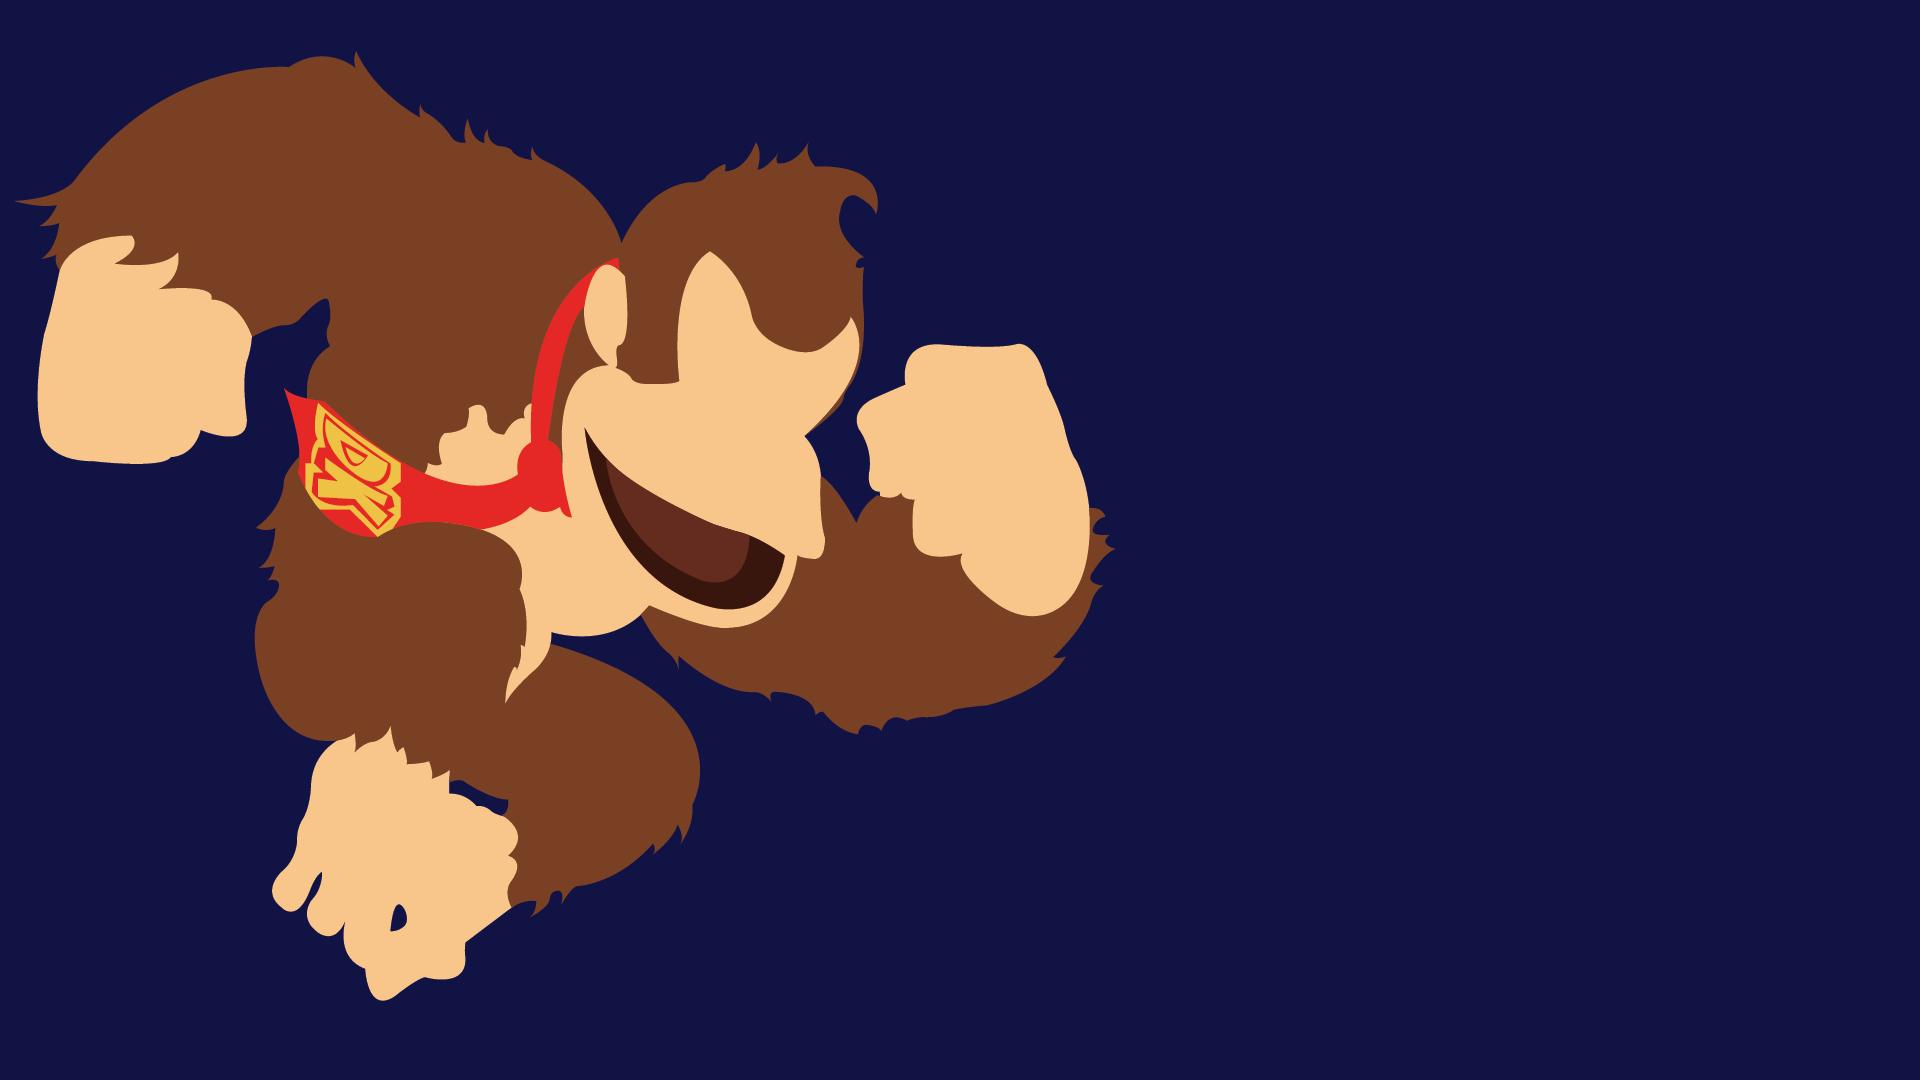 Donkey Kong Wallpaper R Smashbros Donkey Kong Stock Art Wallpaper